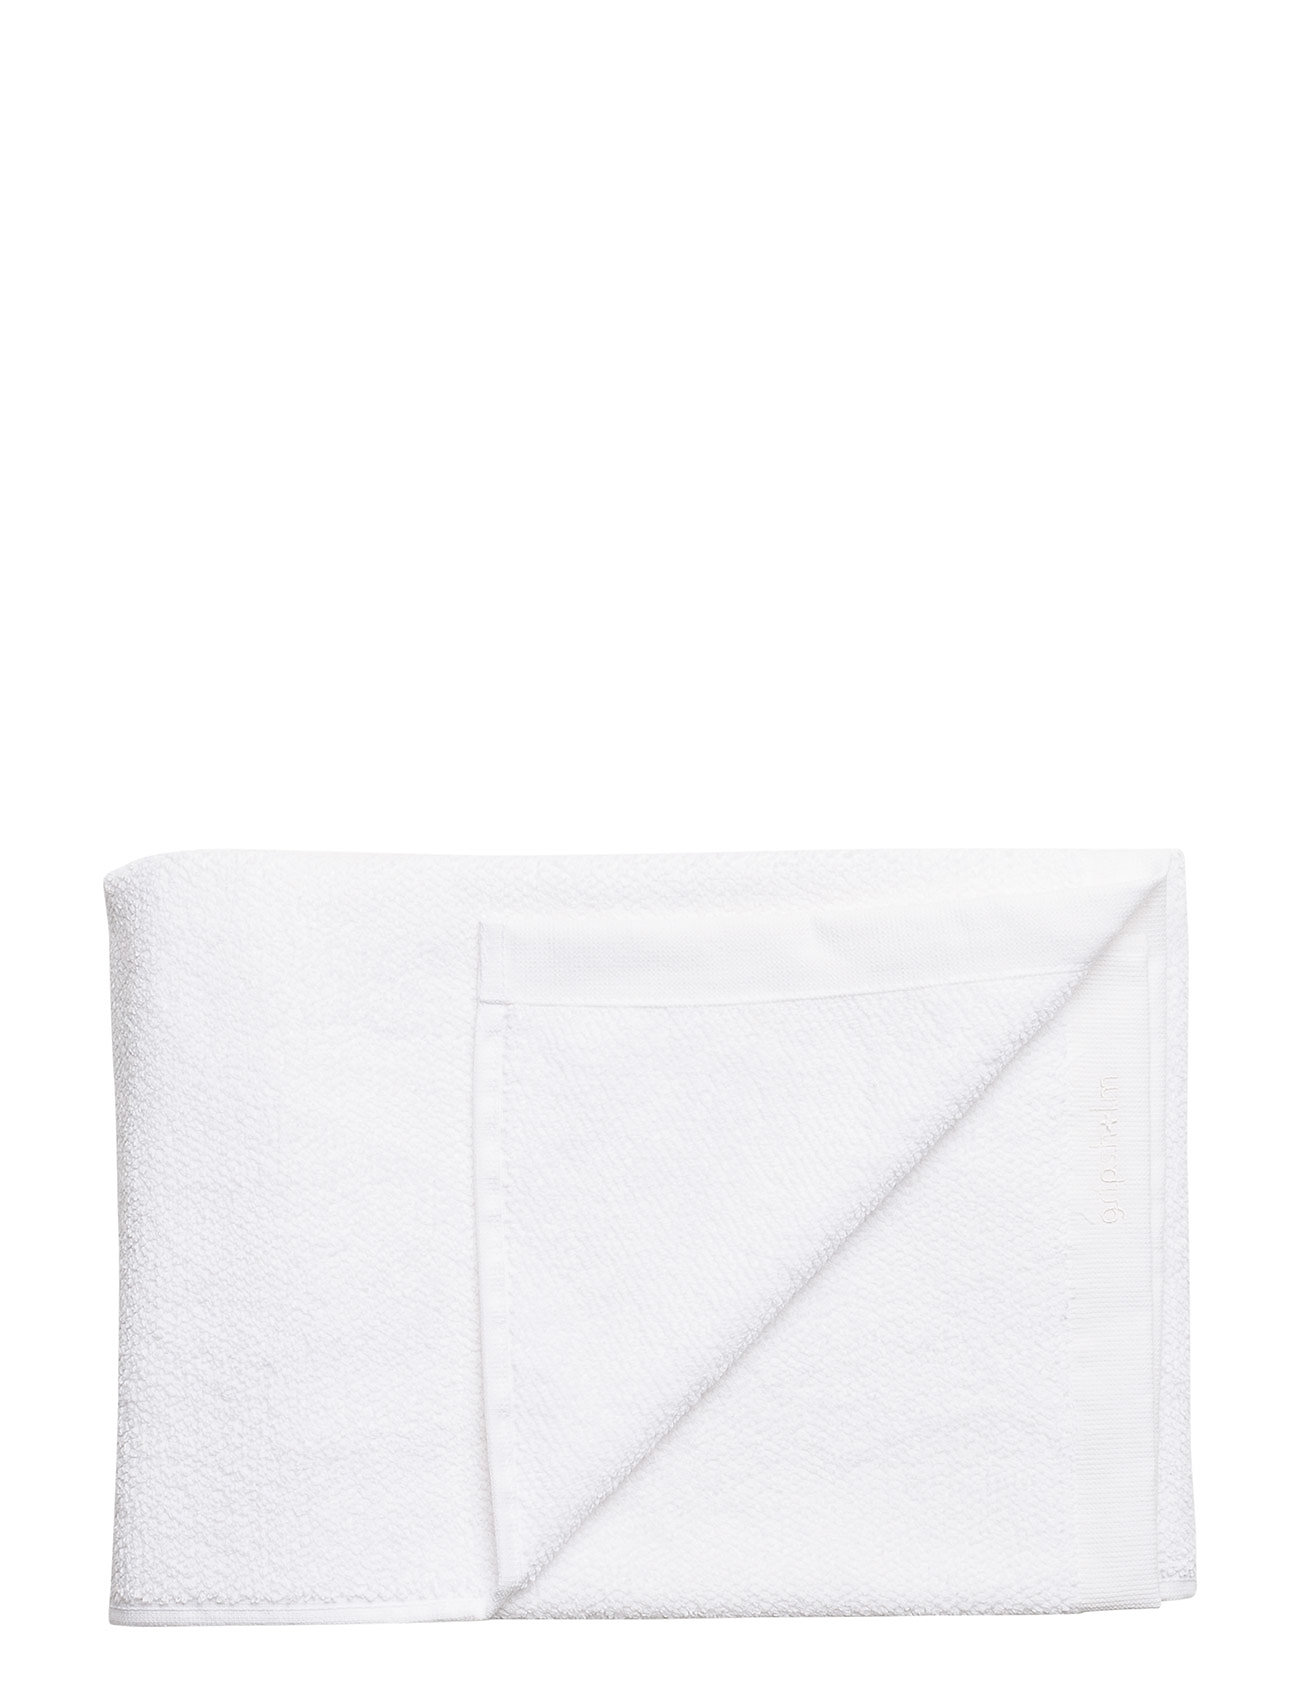 Towel LinenwhiteGripsholm Bath Bath Cotton Towel Cotton Cotton Towel Bath LinenwhiteGripsholm Bath Towel LinenwhiteGripsholm kZwOluPTXi